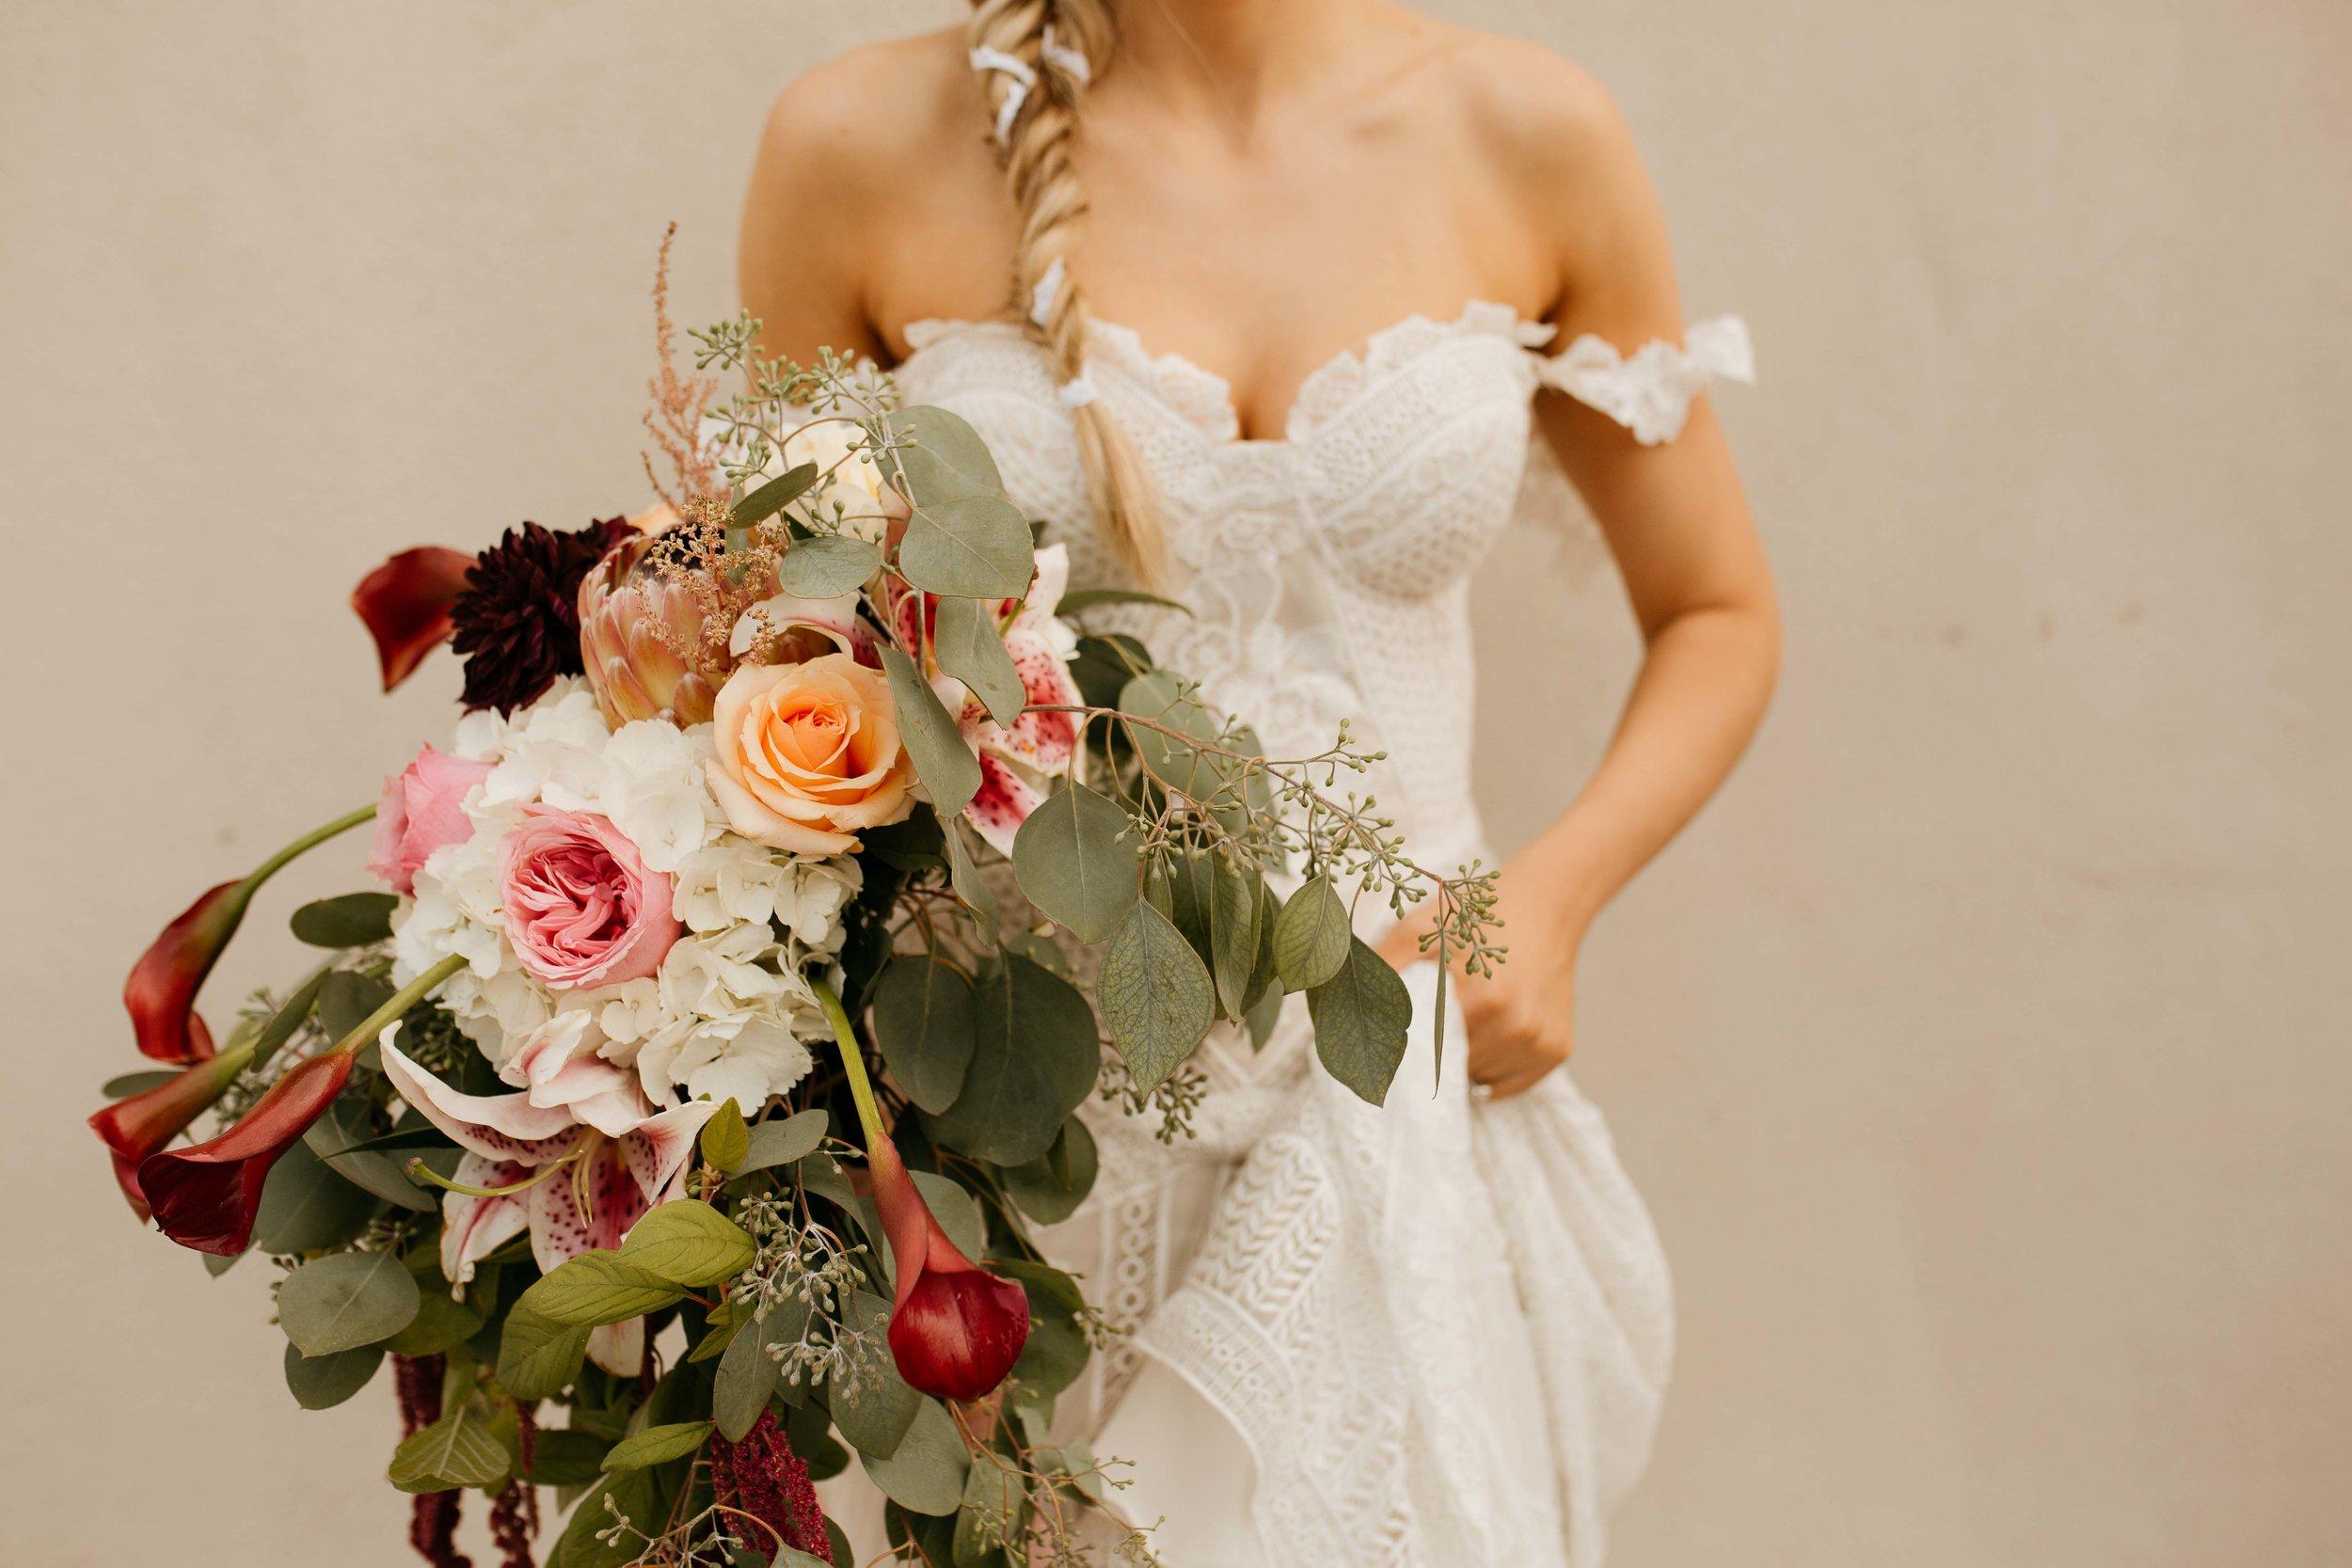 memphis tn wedding-28.jpg